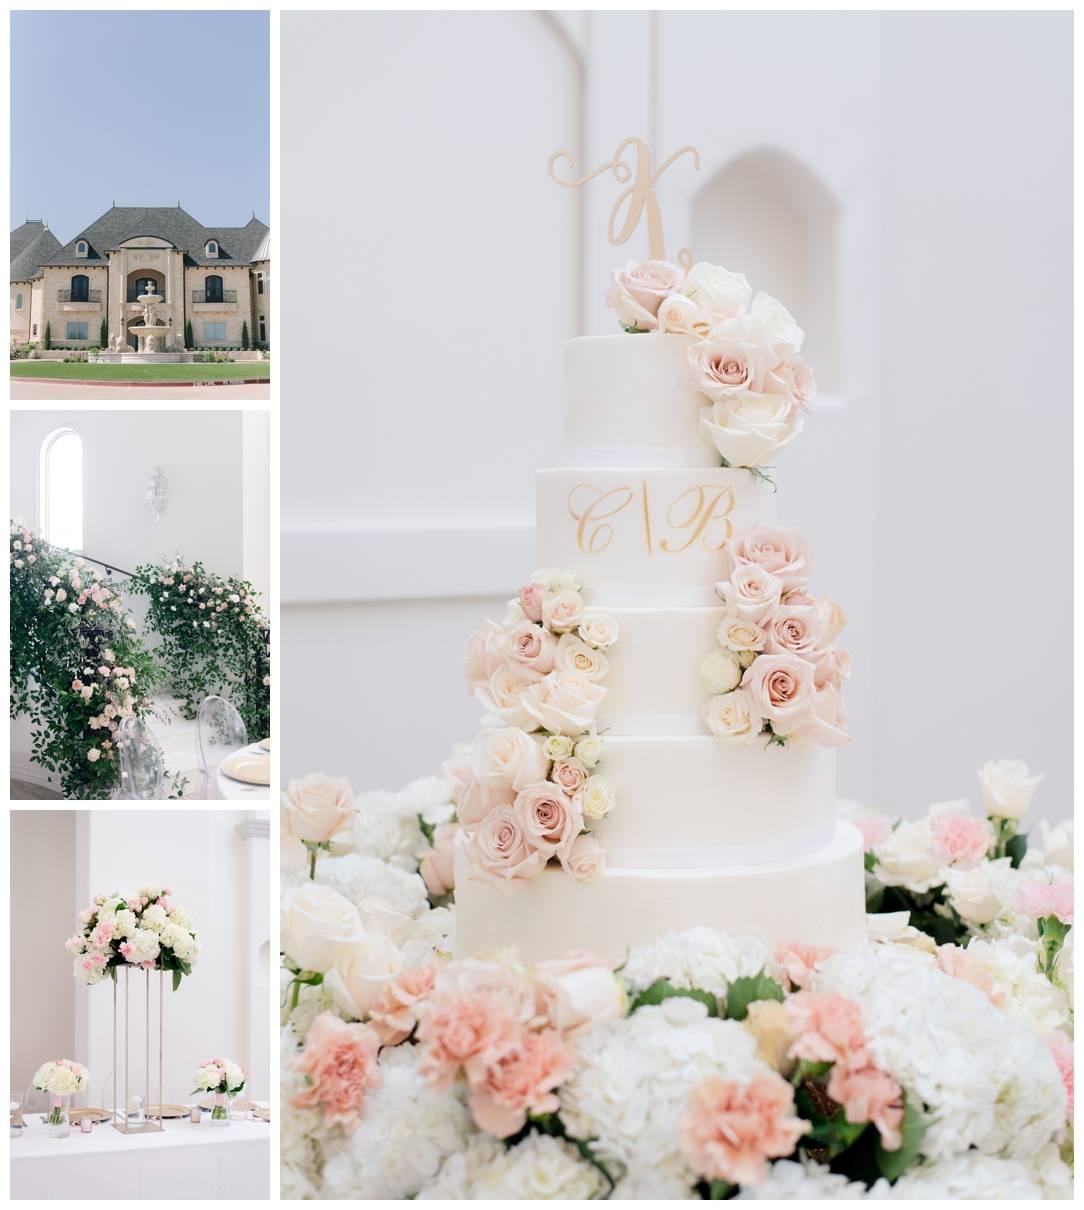 Knotting Hill Place Blush and Ivory Wedding Inspiration.jpg